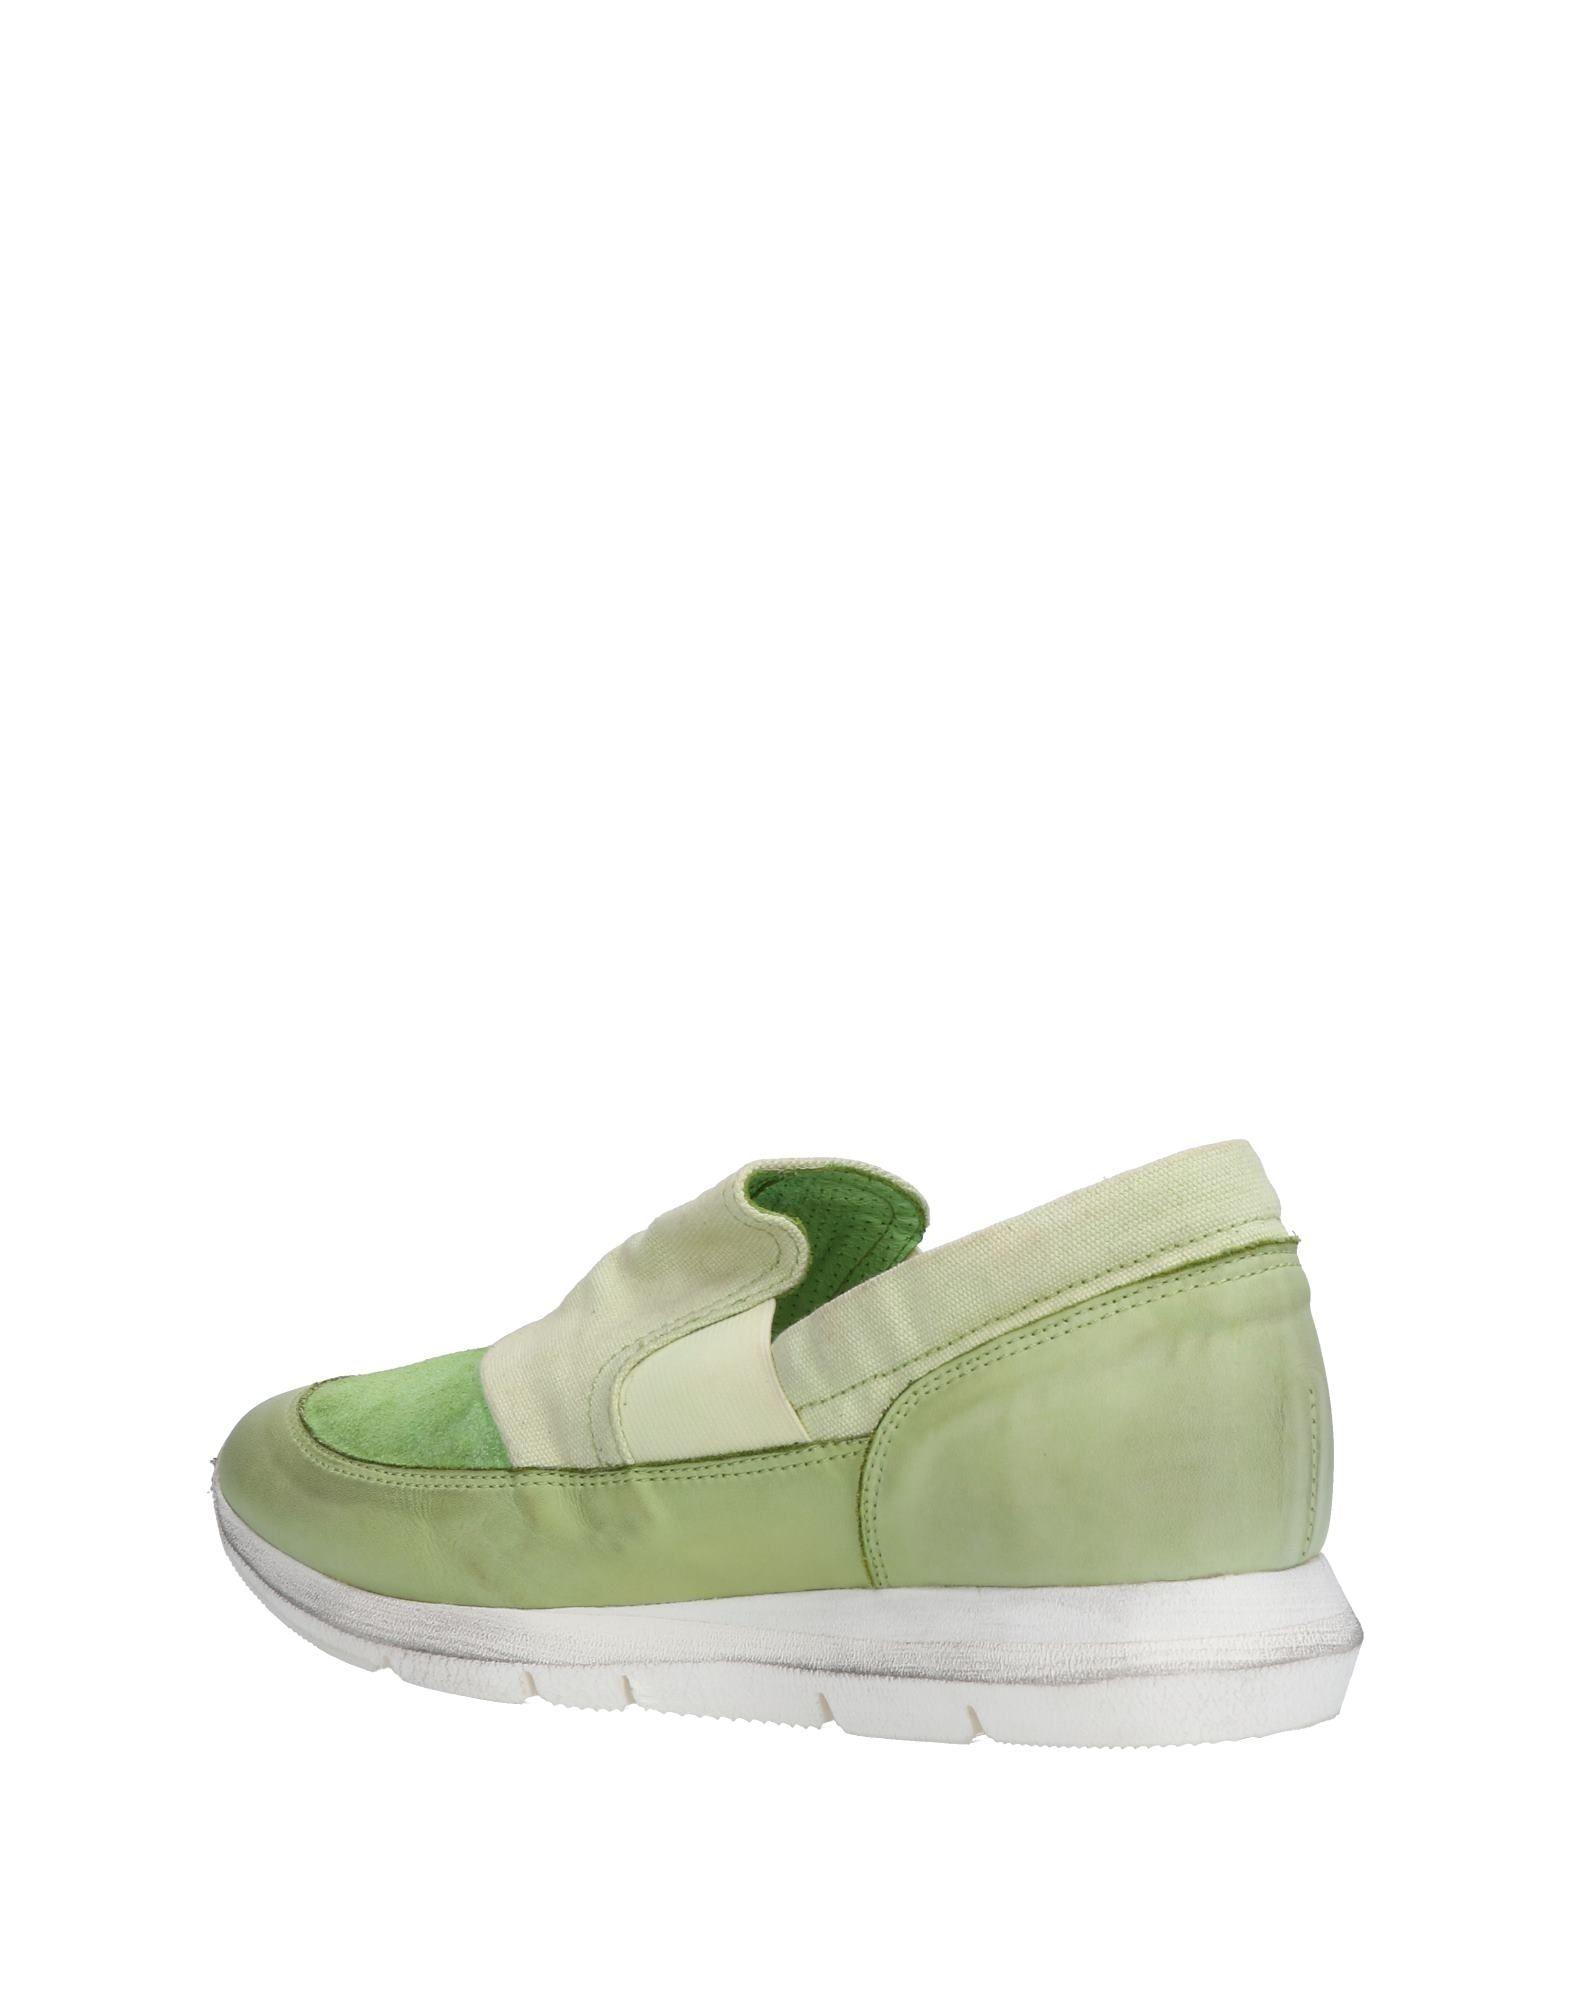 O.X.S. O.X.S. O.X.S. Sneakers - Women O.X.S. Sneakers online on  United Kingdom - 11509827LK a165c1